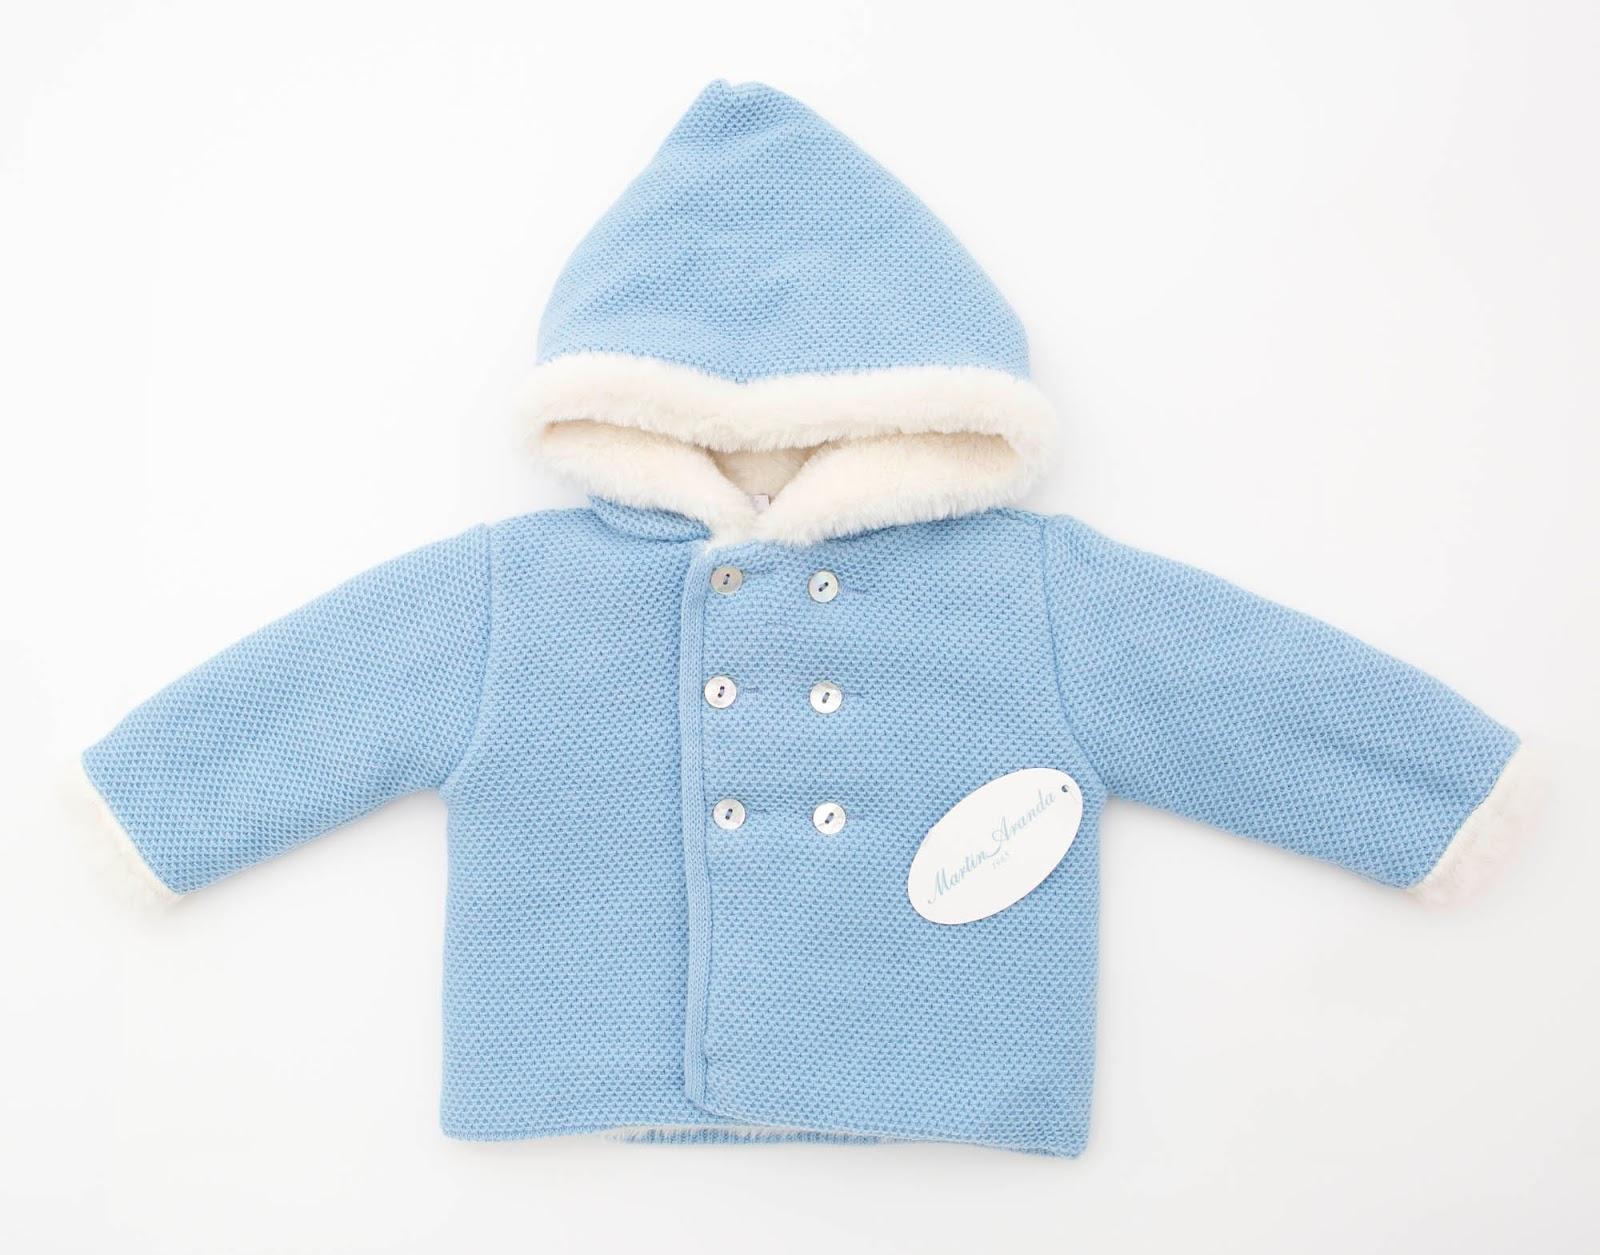 f09cbbb9955 MARTIN ARANDA BABY CLOTHES COLLECTION AT MASIEL BEBE